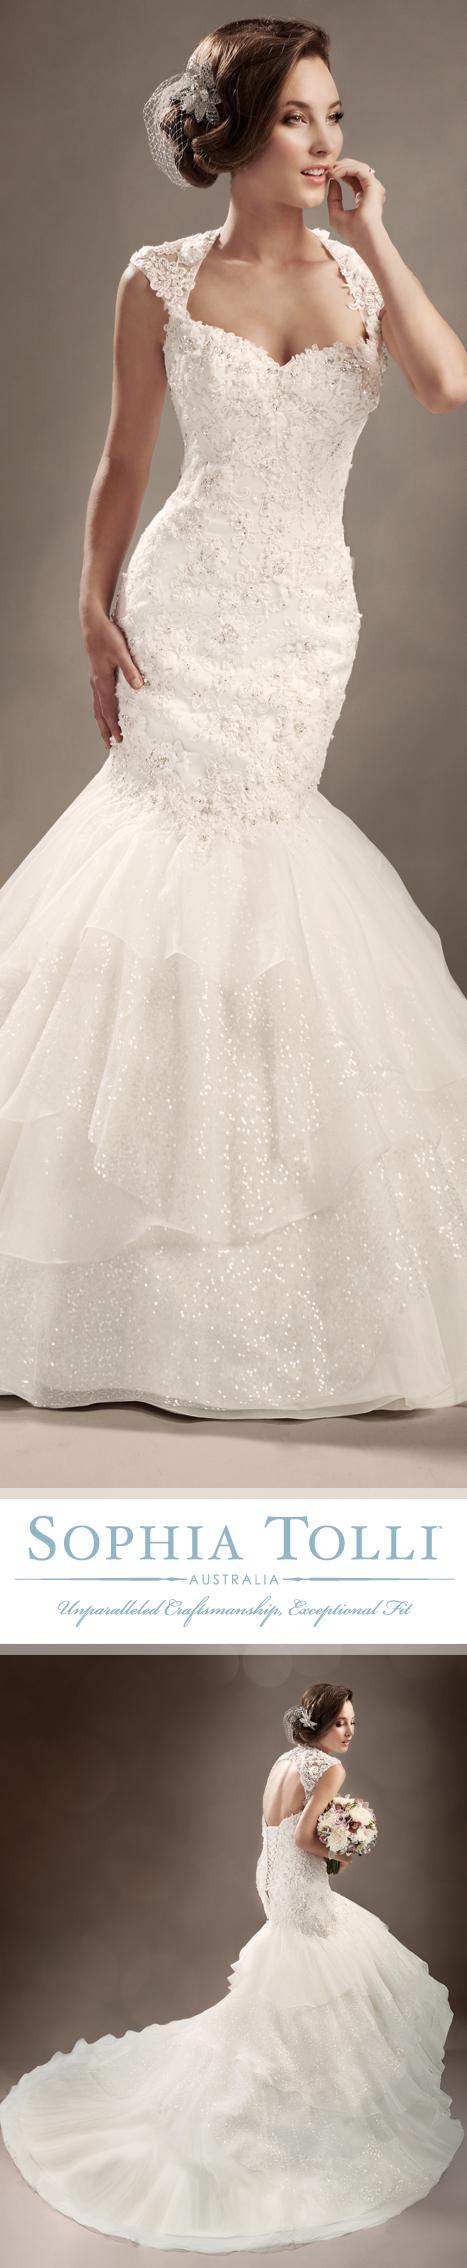 Sophia Tolli Wedding Dresses 2018 For Mon Cheri